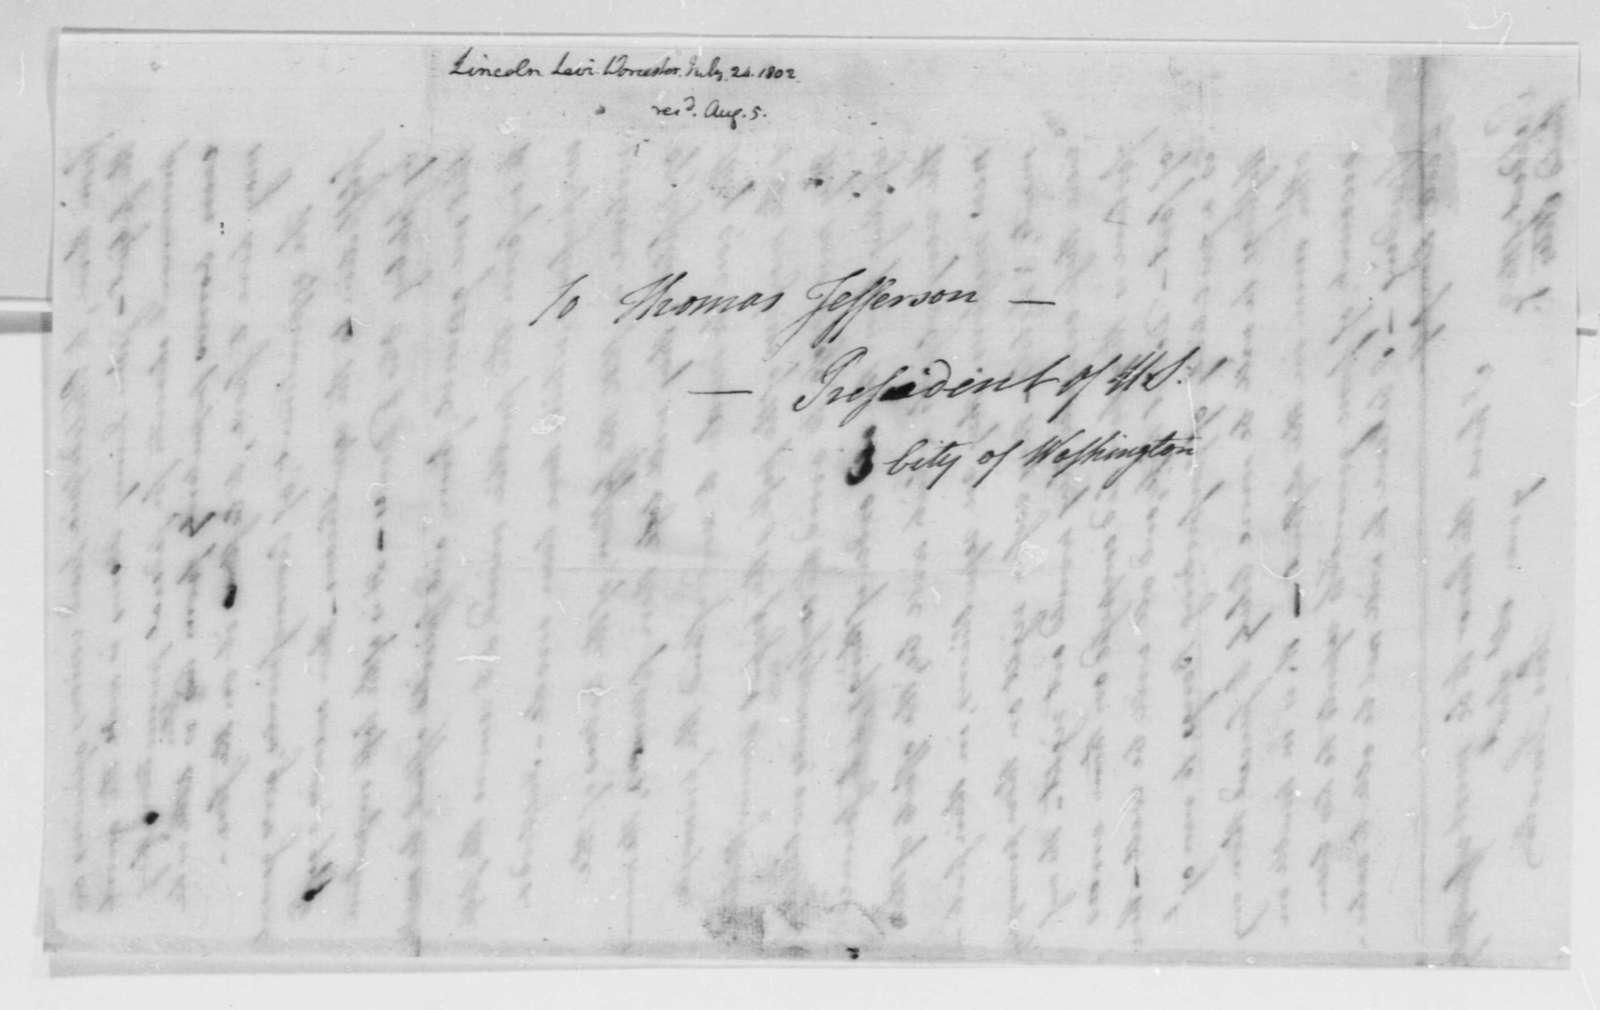 Levi Lincoln to Thomas Jefferson, July 25, 1802